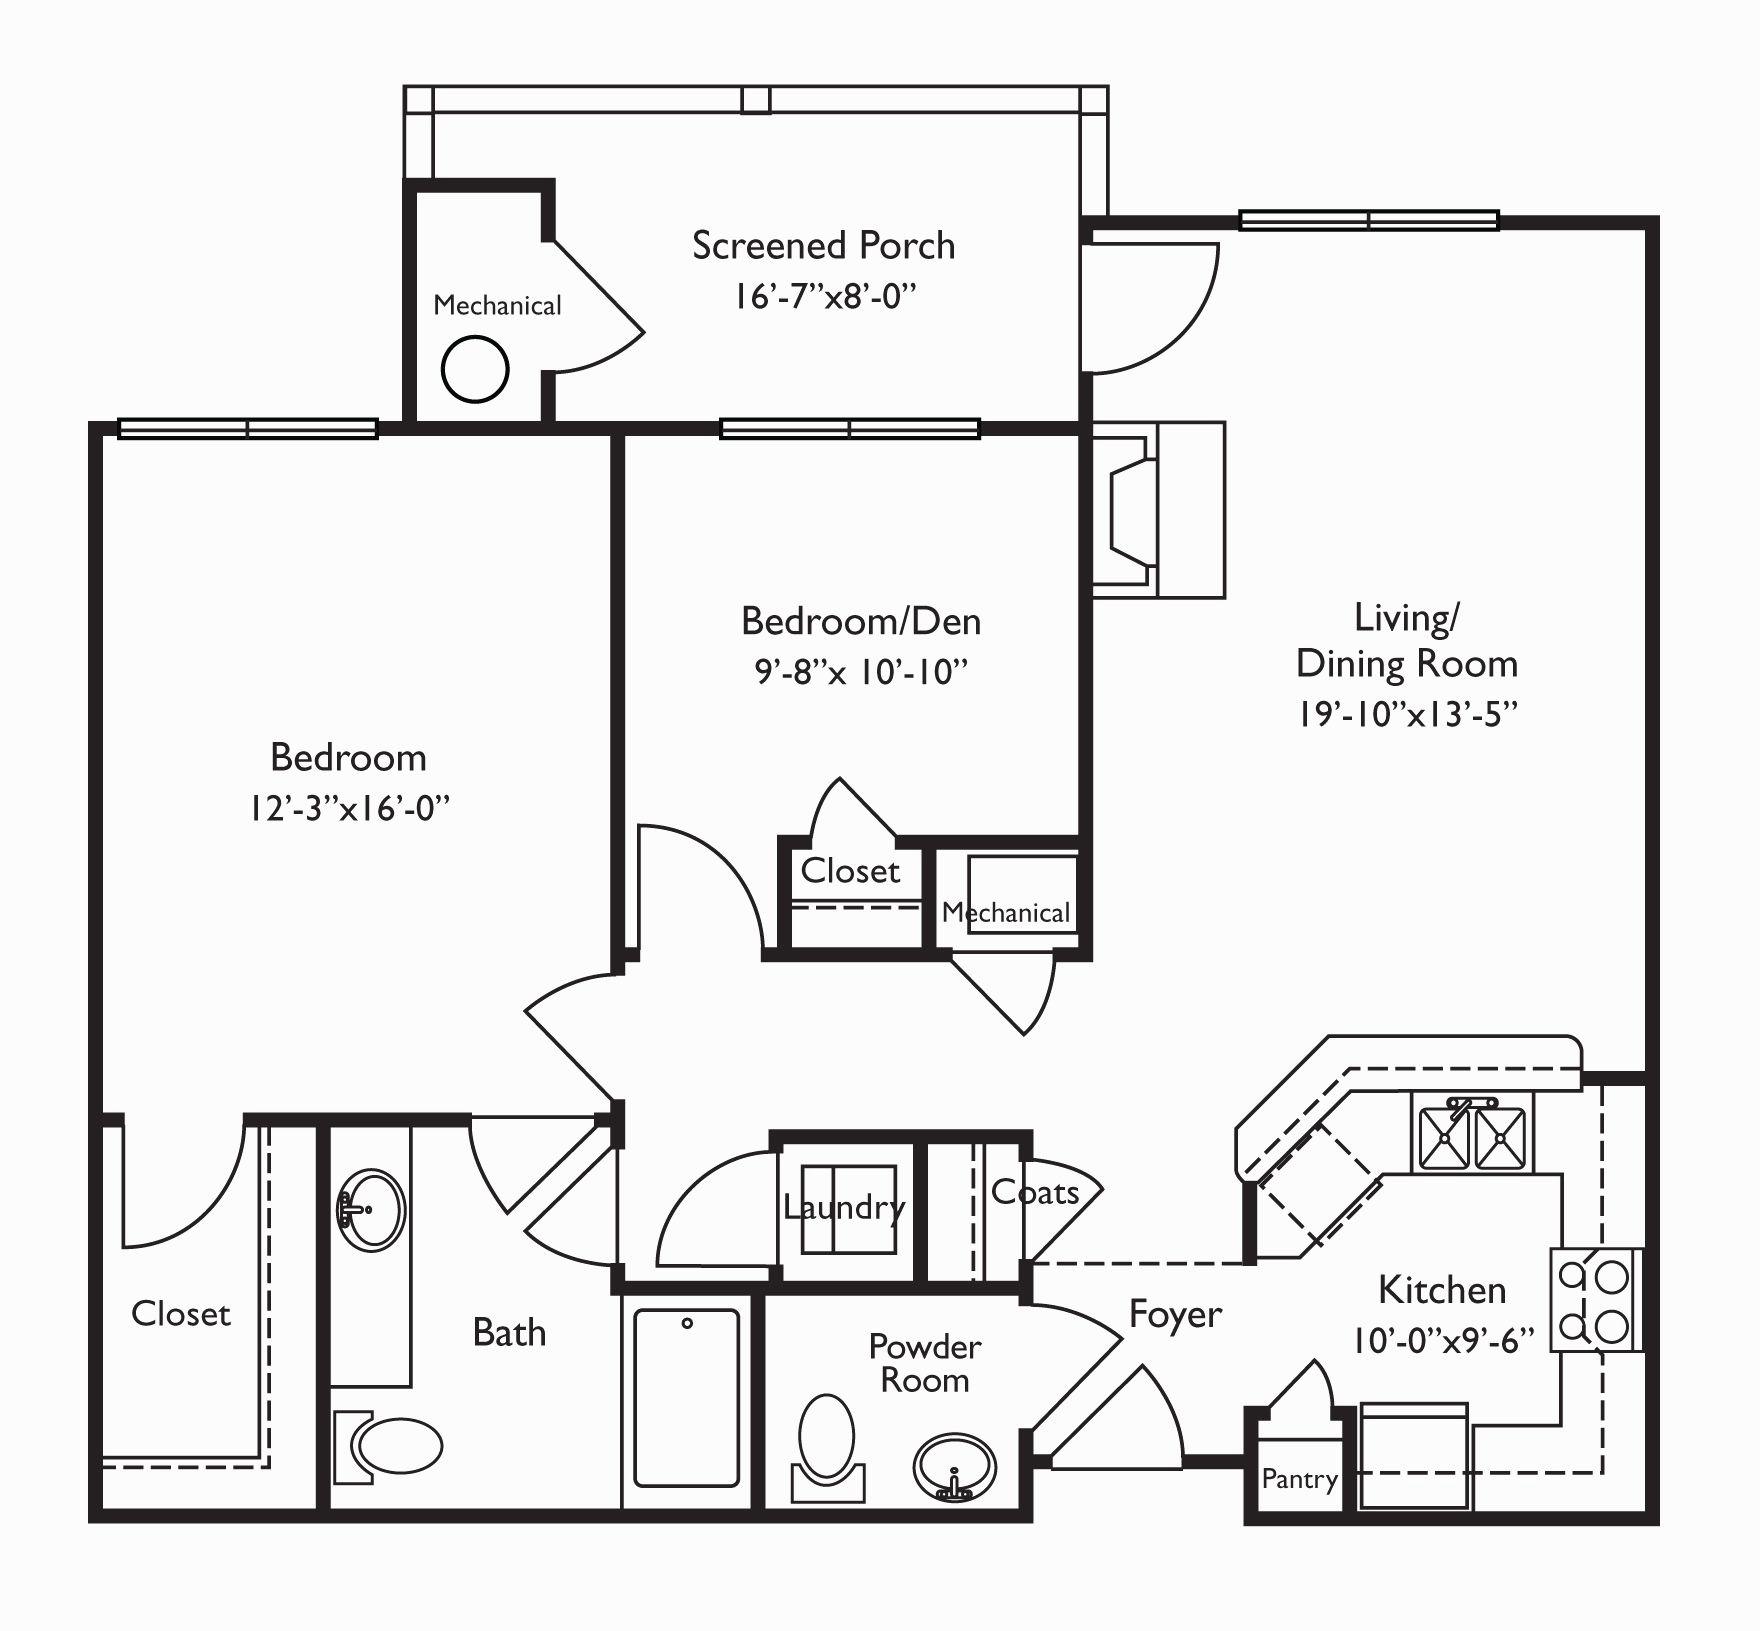 Best Selling House Plans Fantastic Retirement House Floor